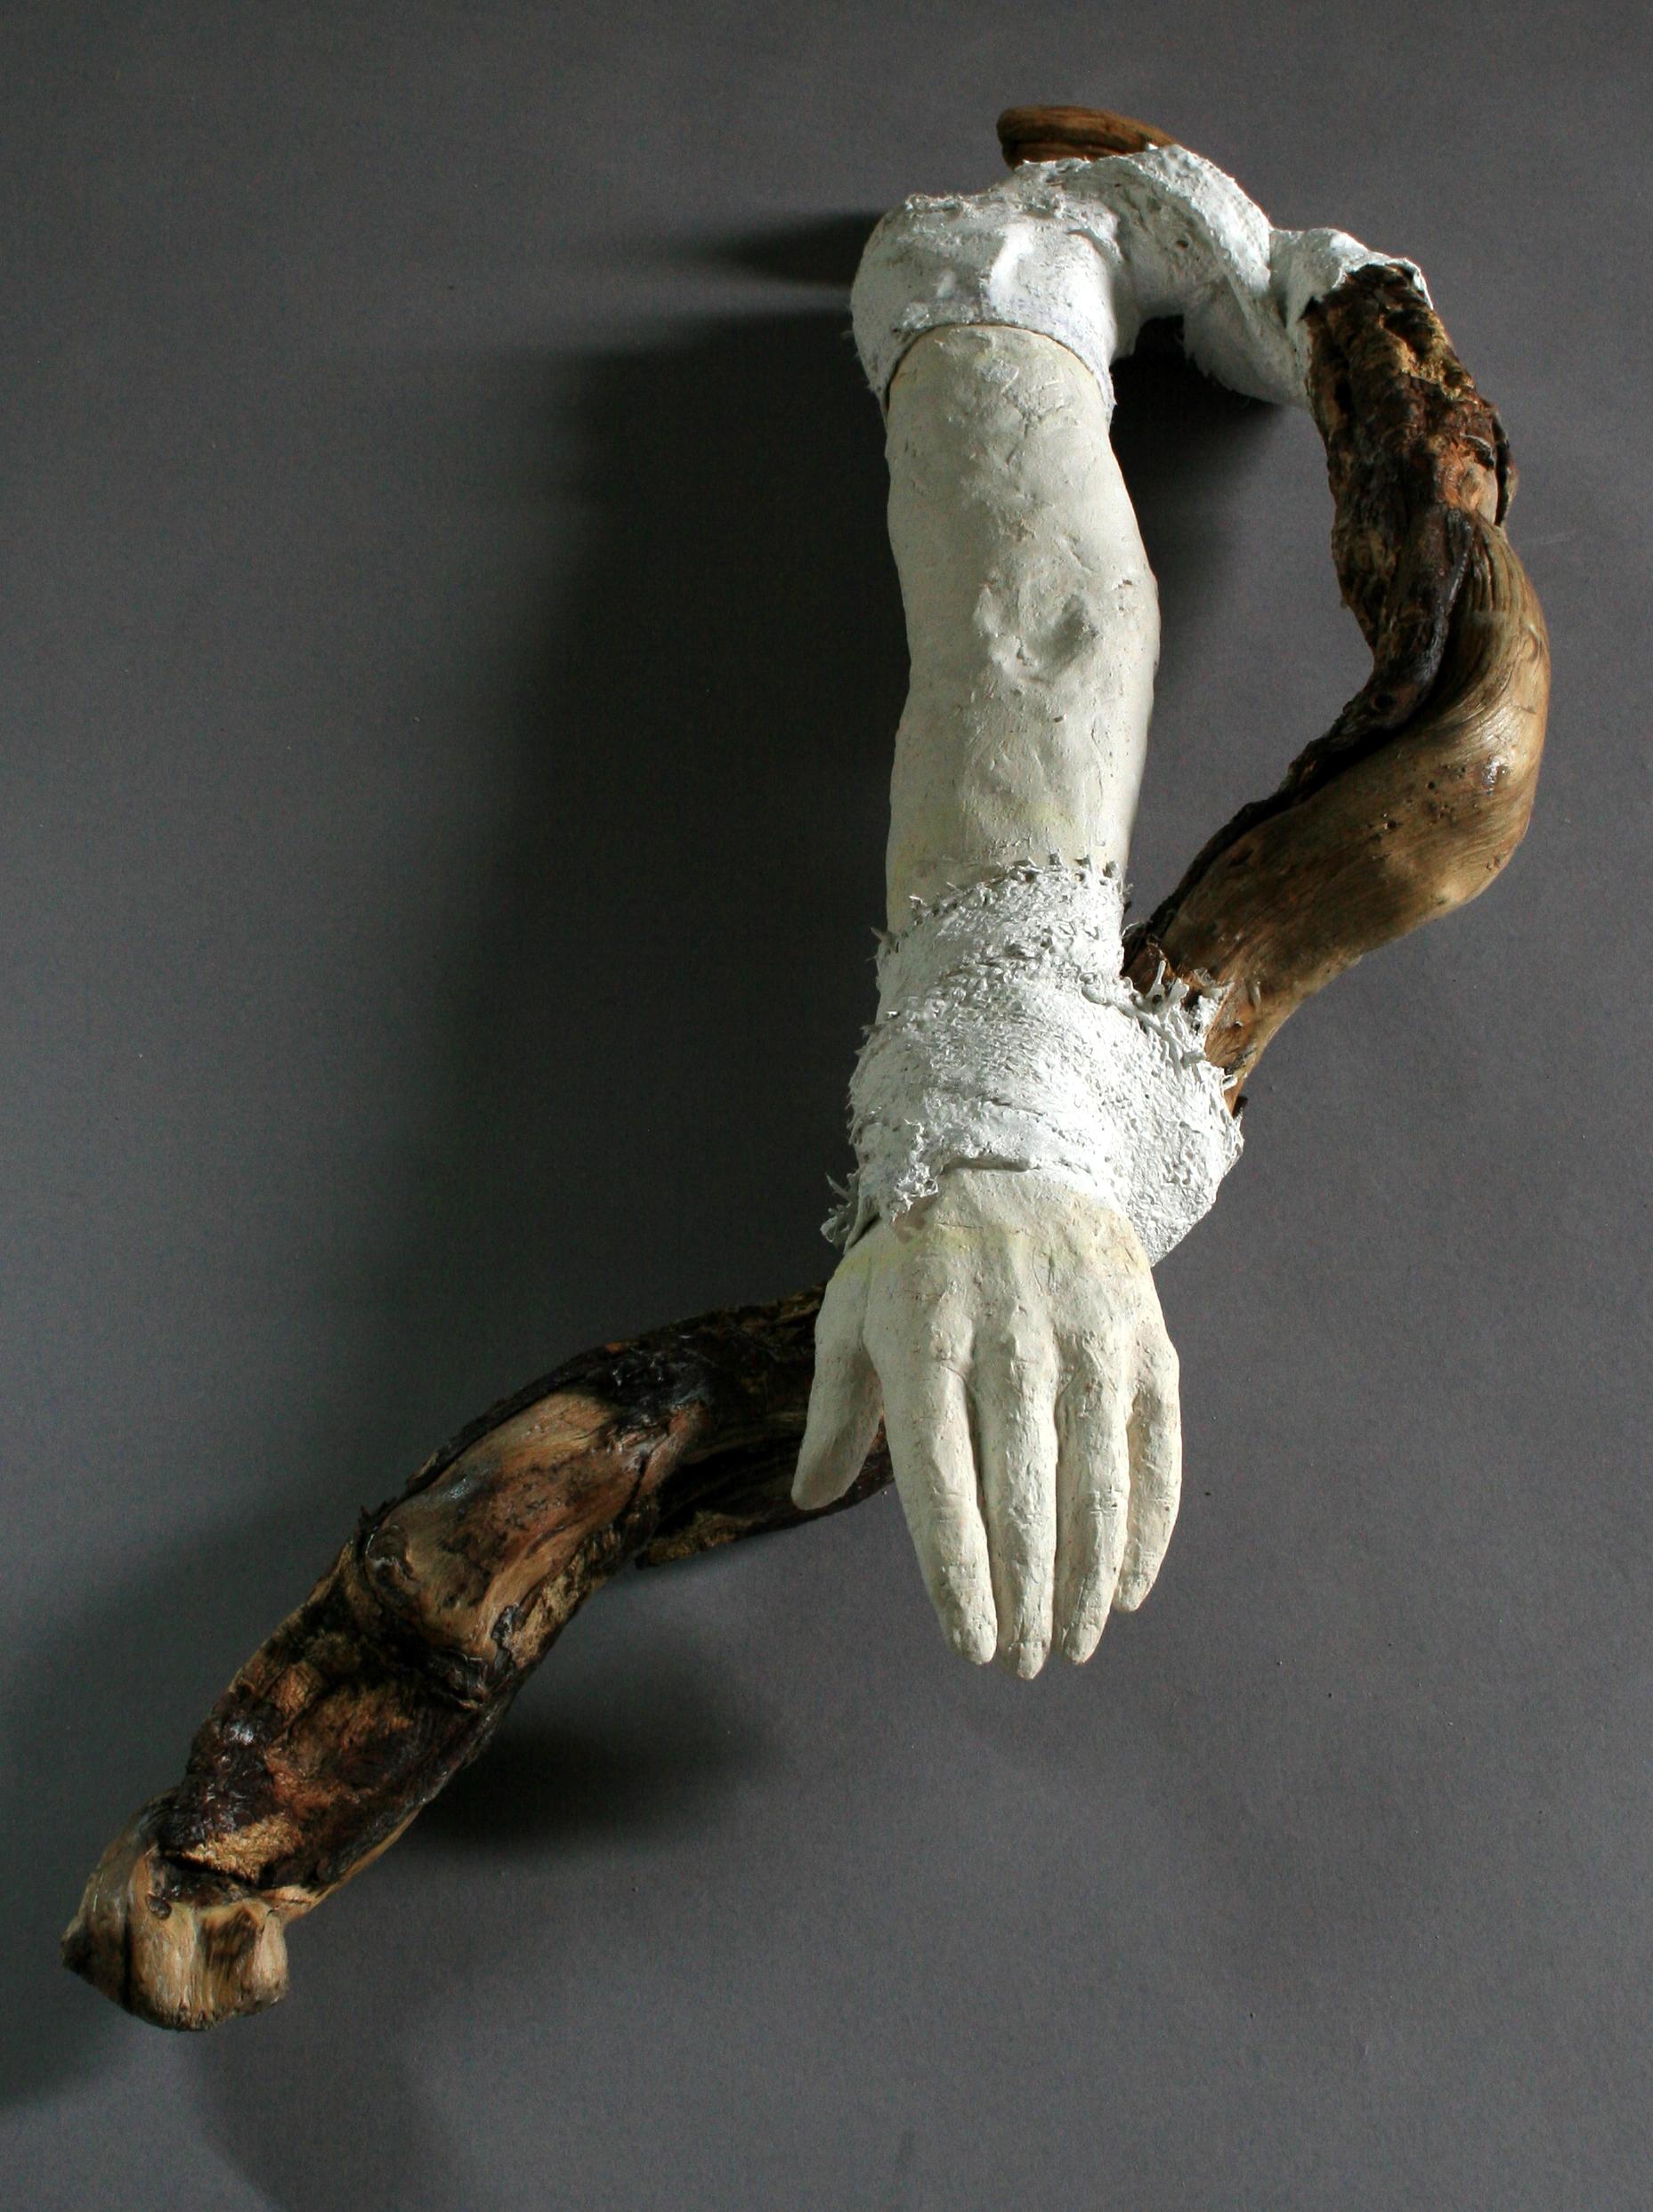 Autotomized Limb (arm)